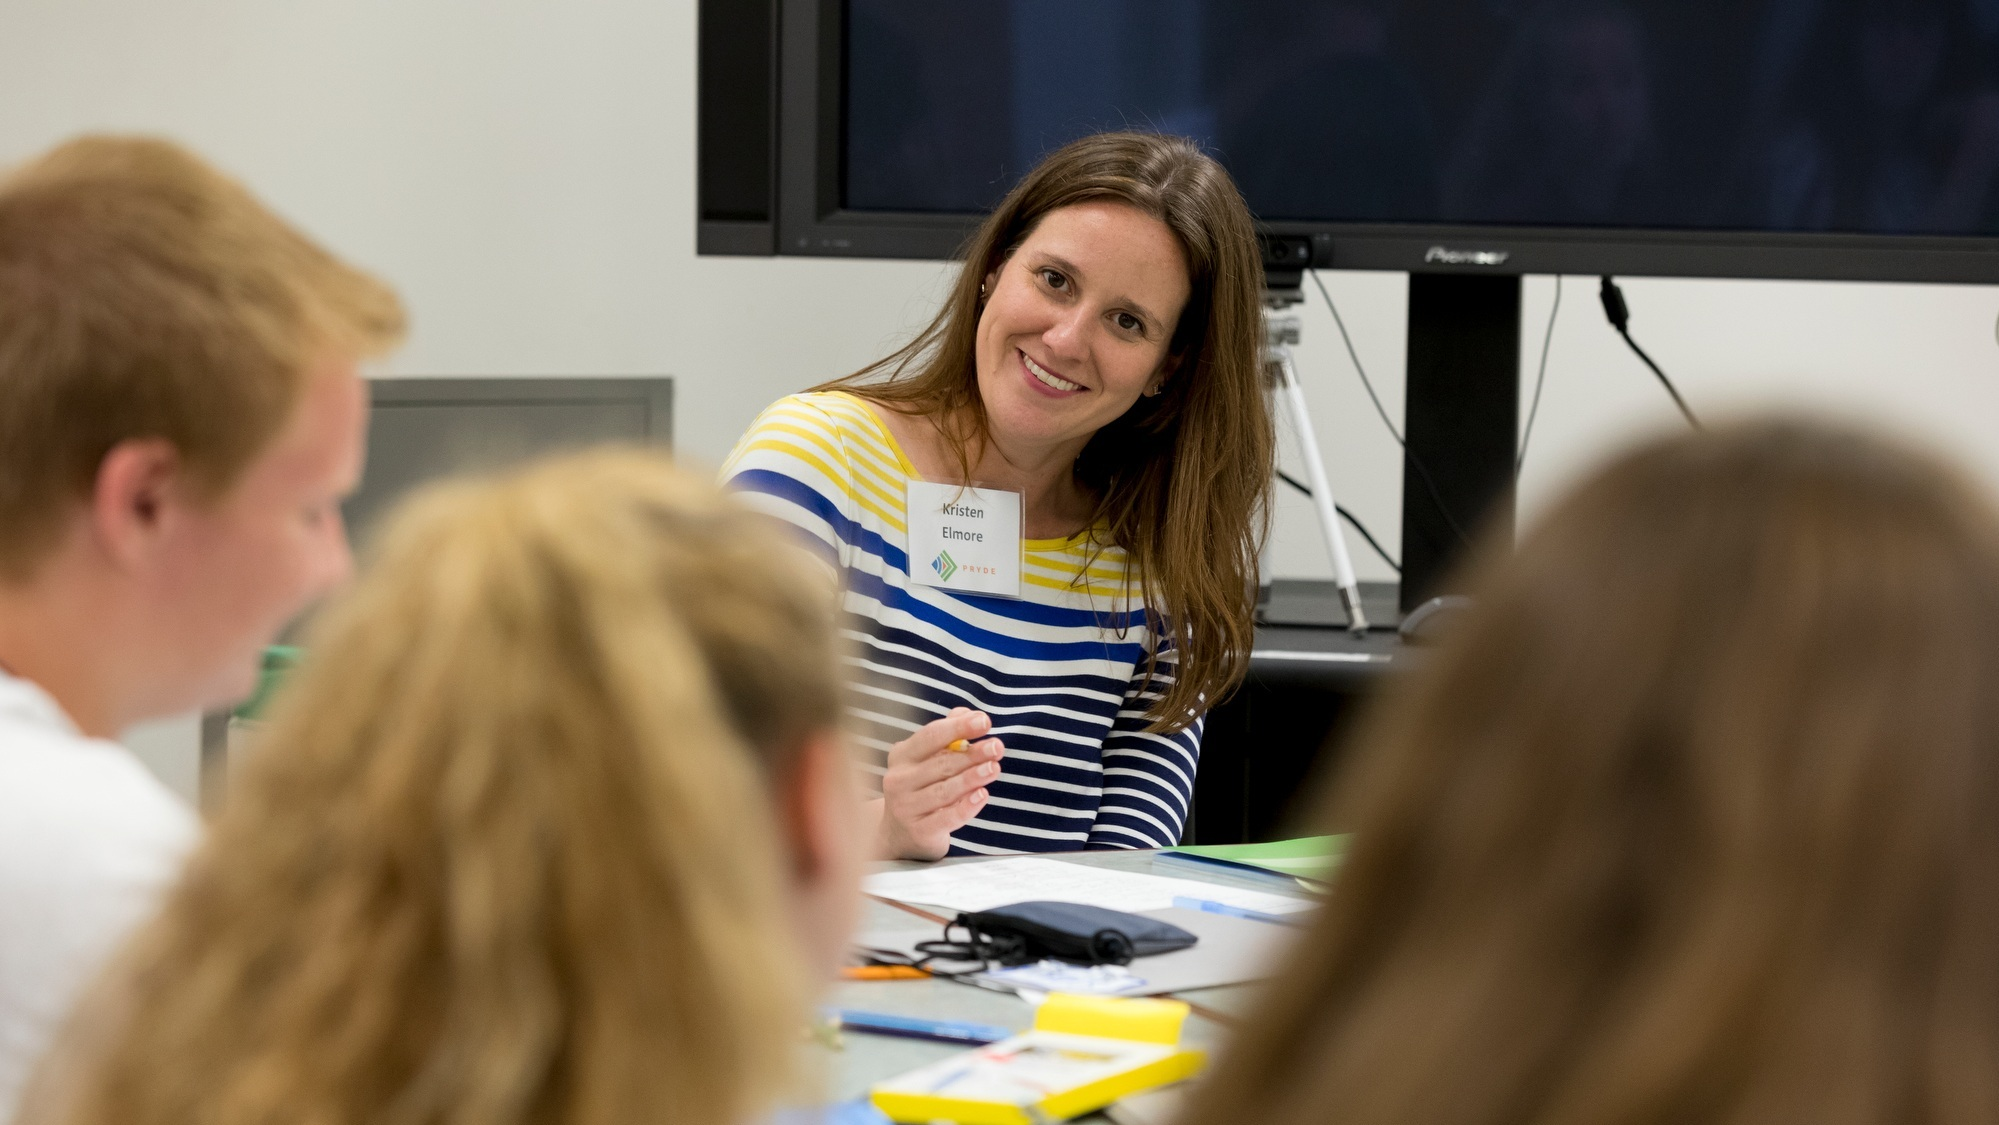 Kristen Elmore, PRYDE's new assistant director